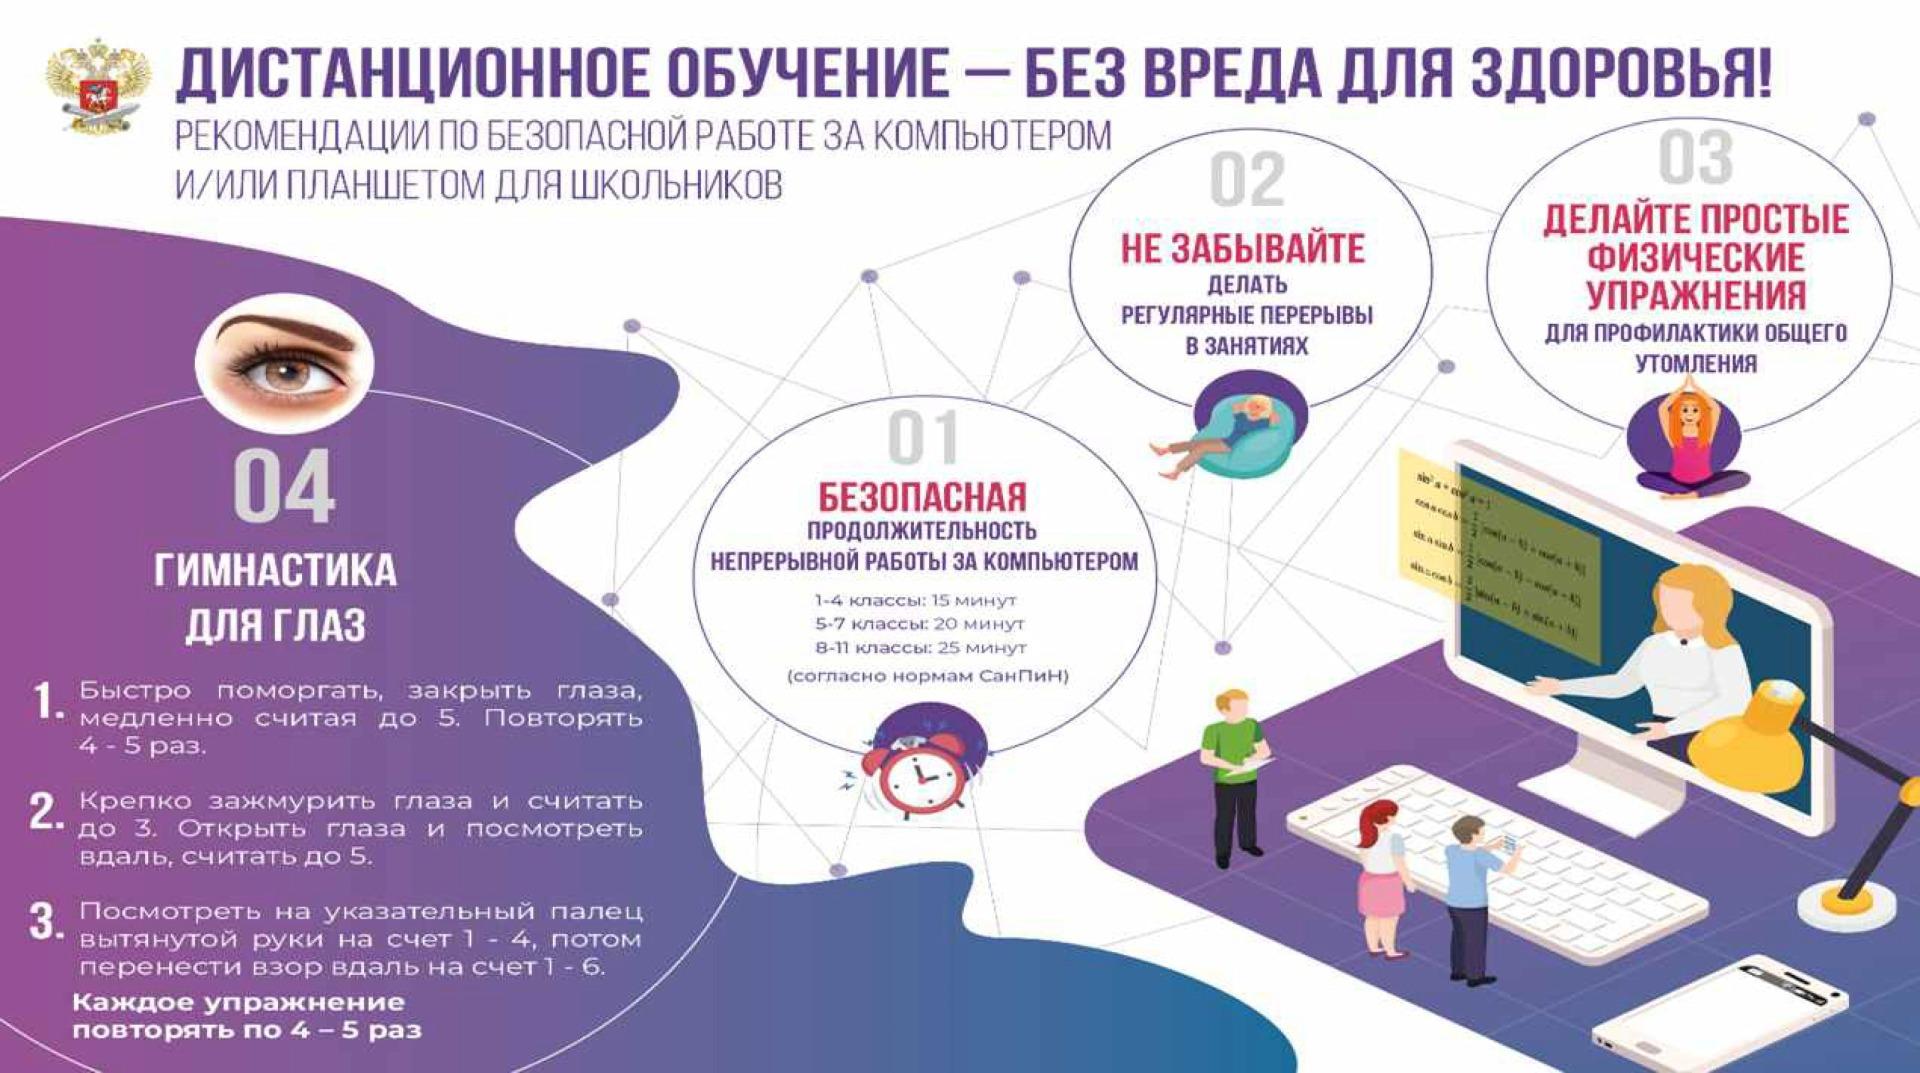 http://i.mvsosh4.ru/u/69/7d23187a7c11ea8aa3eeb7ac1c59b2/-/2.jpg